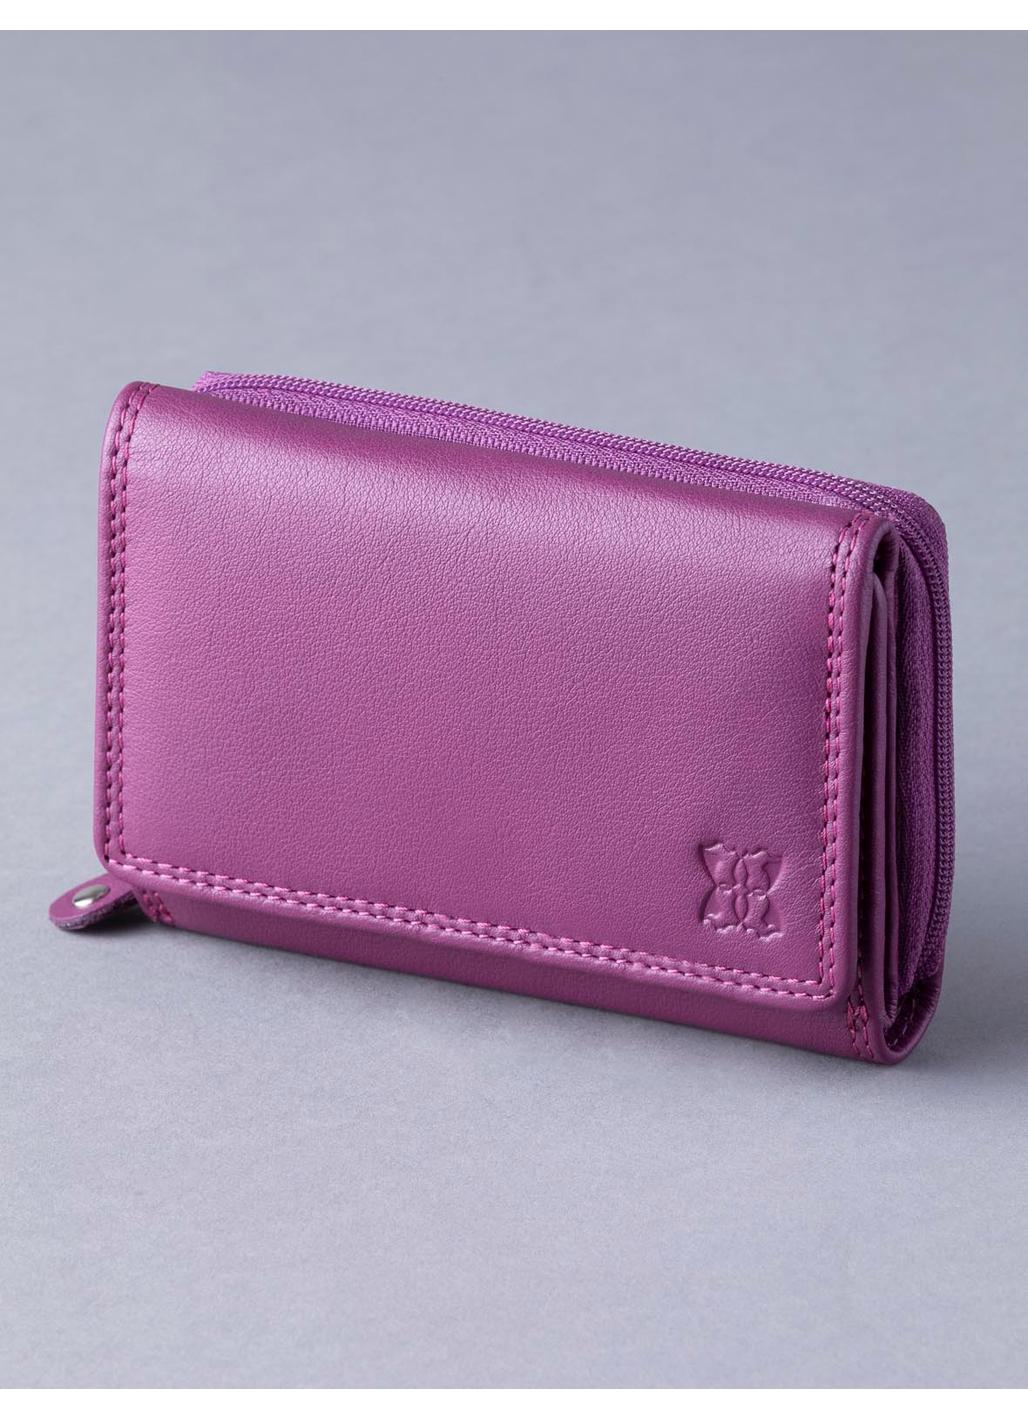 12.5cm Leather Purse in Fuchsia Pink